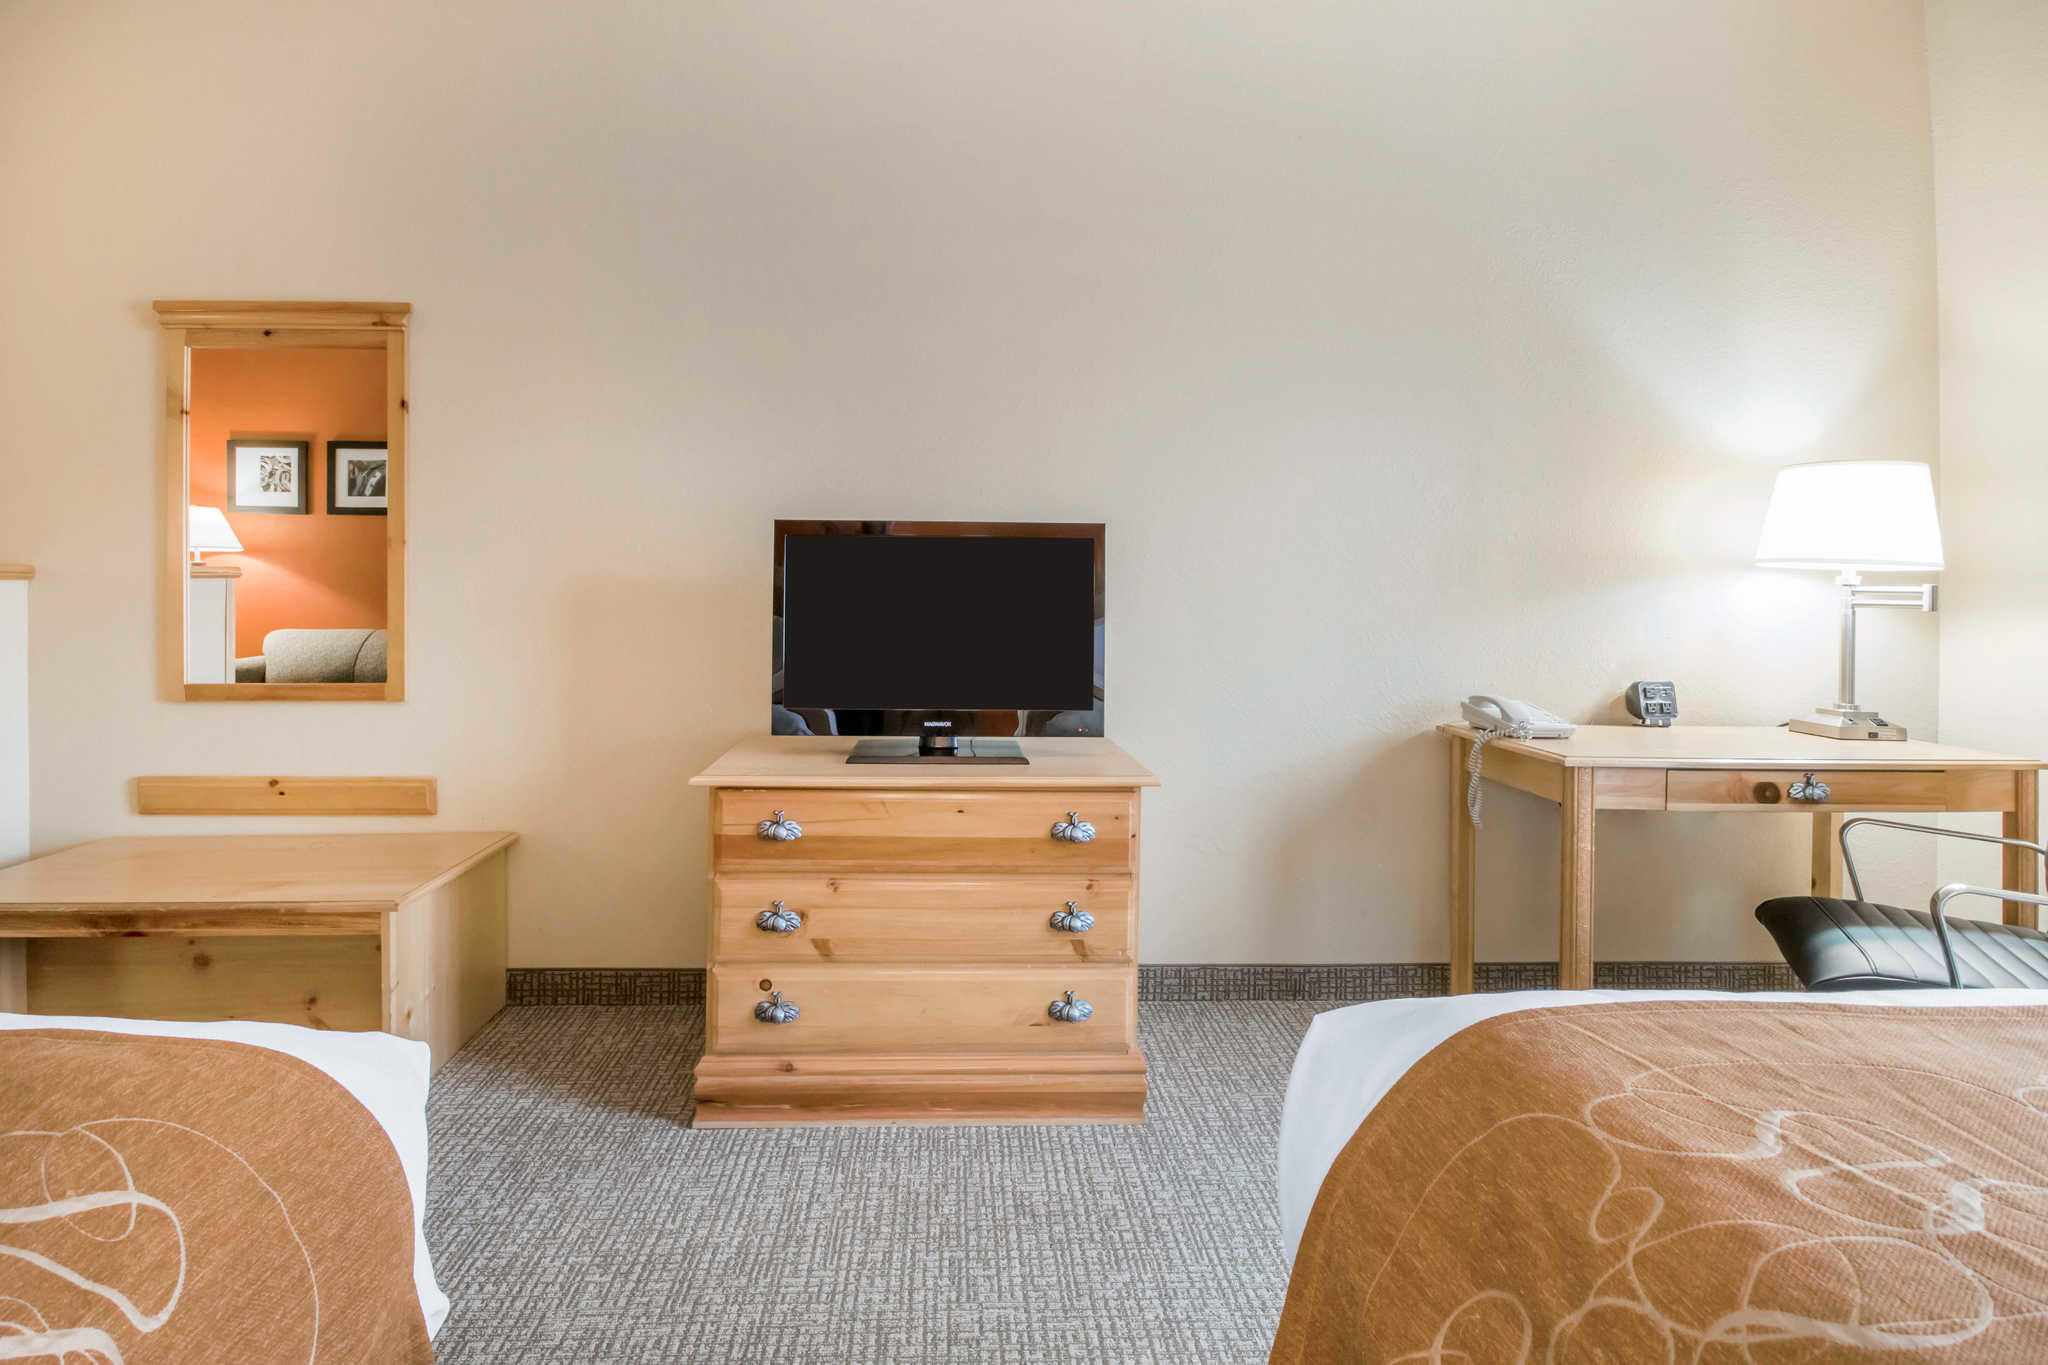 Comfort Suites Airport image 13